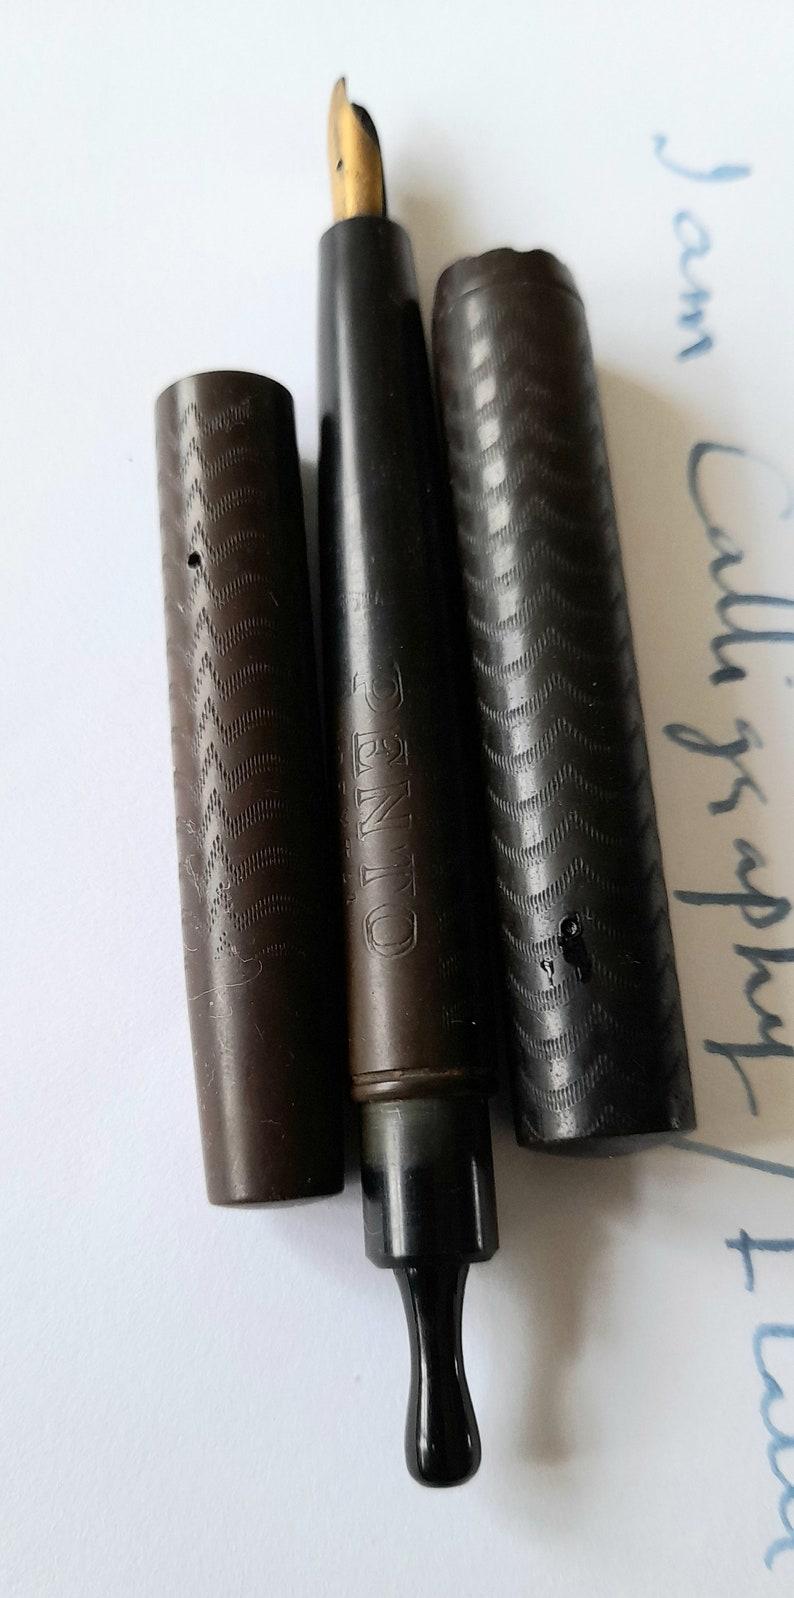 Antique Pento Dexta Hard Rubber Eyedropper Fountain Pen